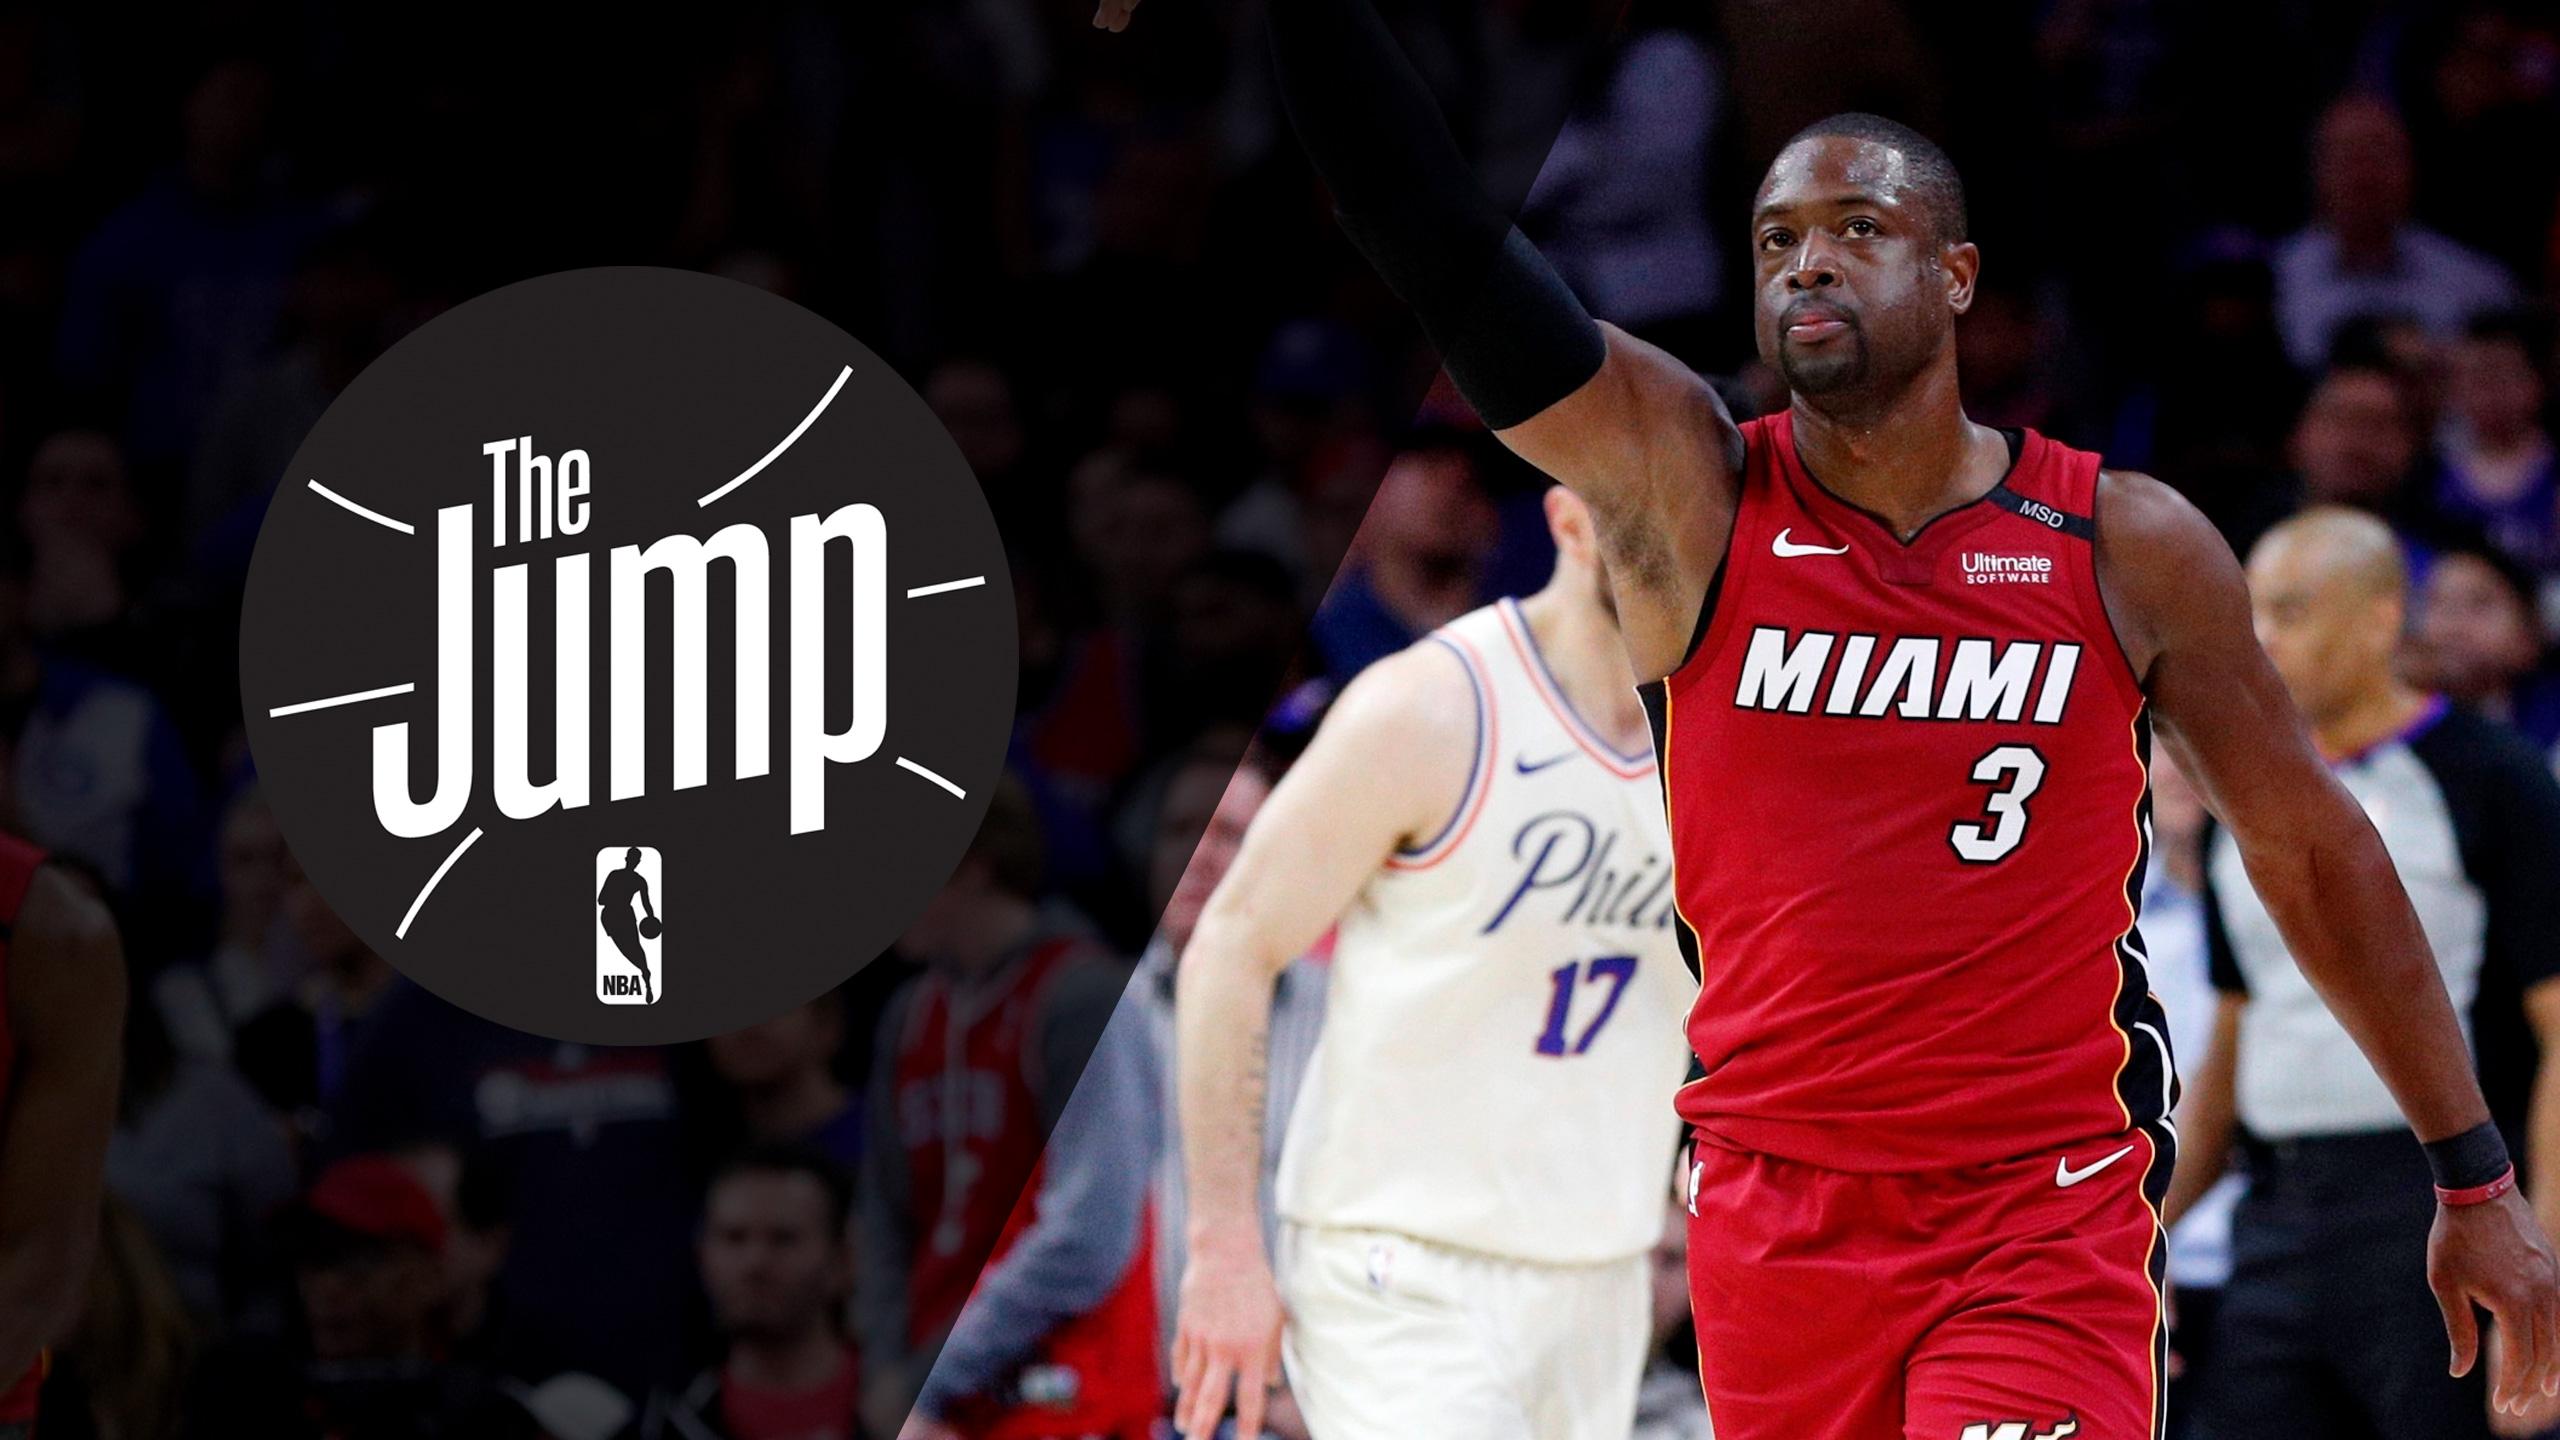 Mon, 9/17 - NBA: The Jump